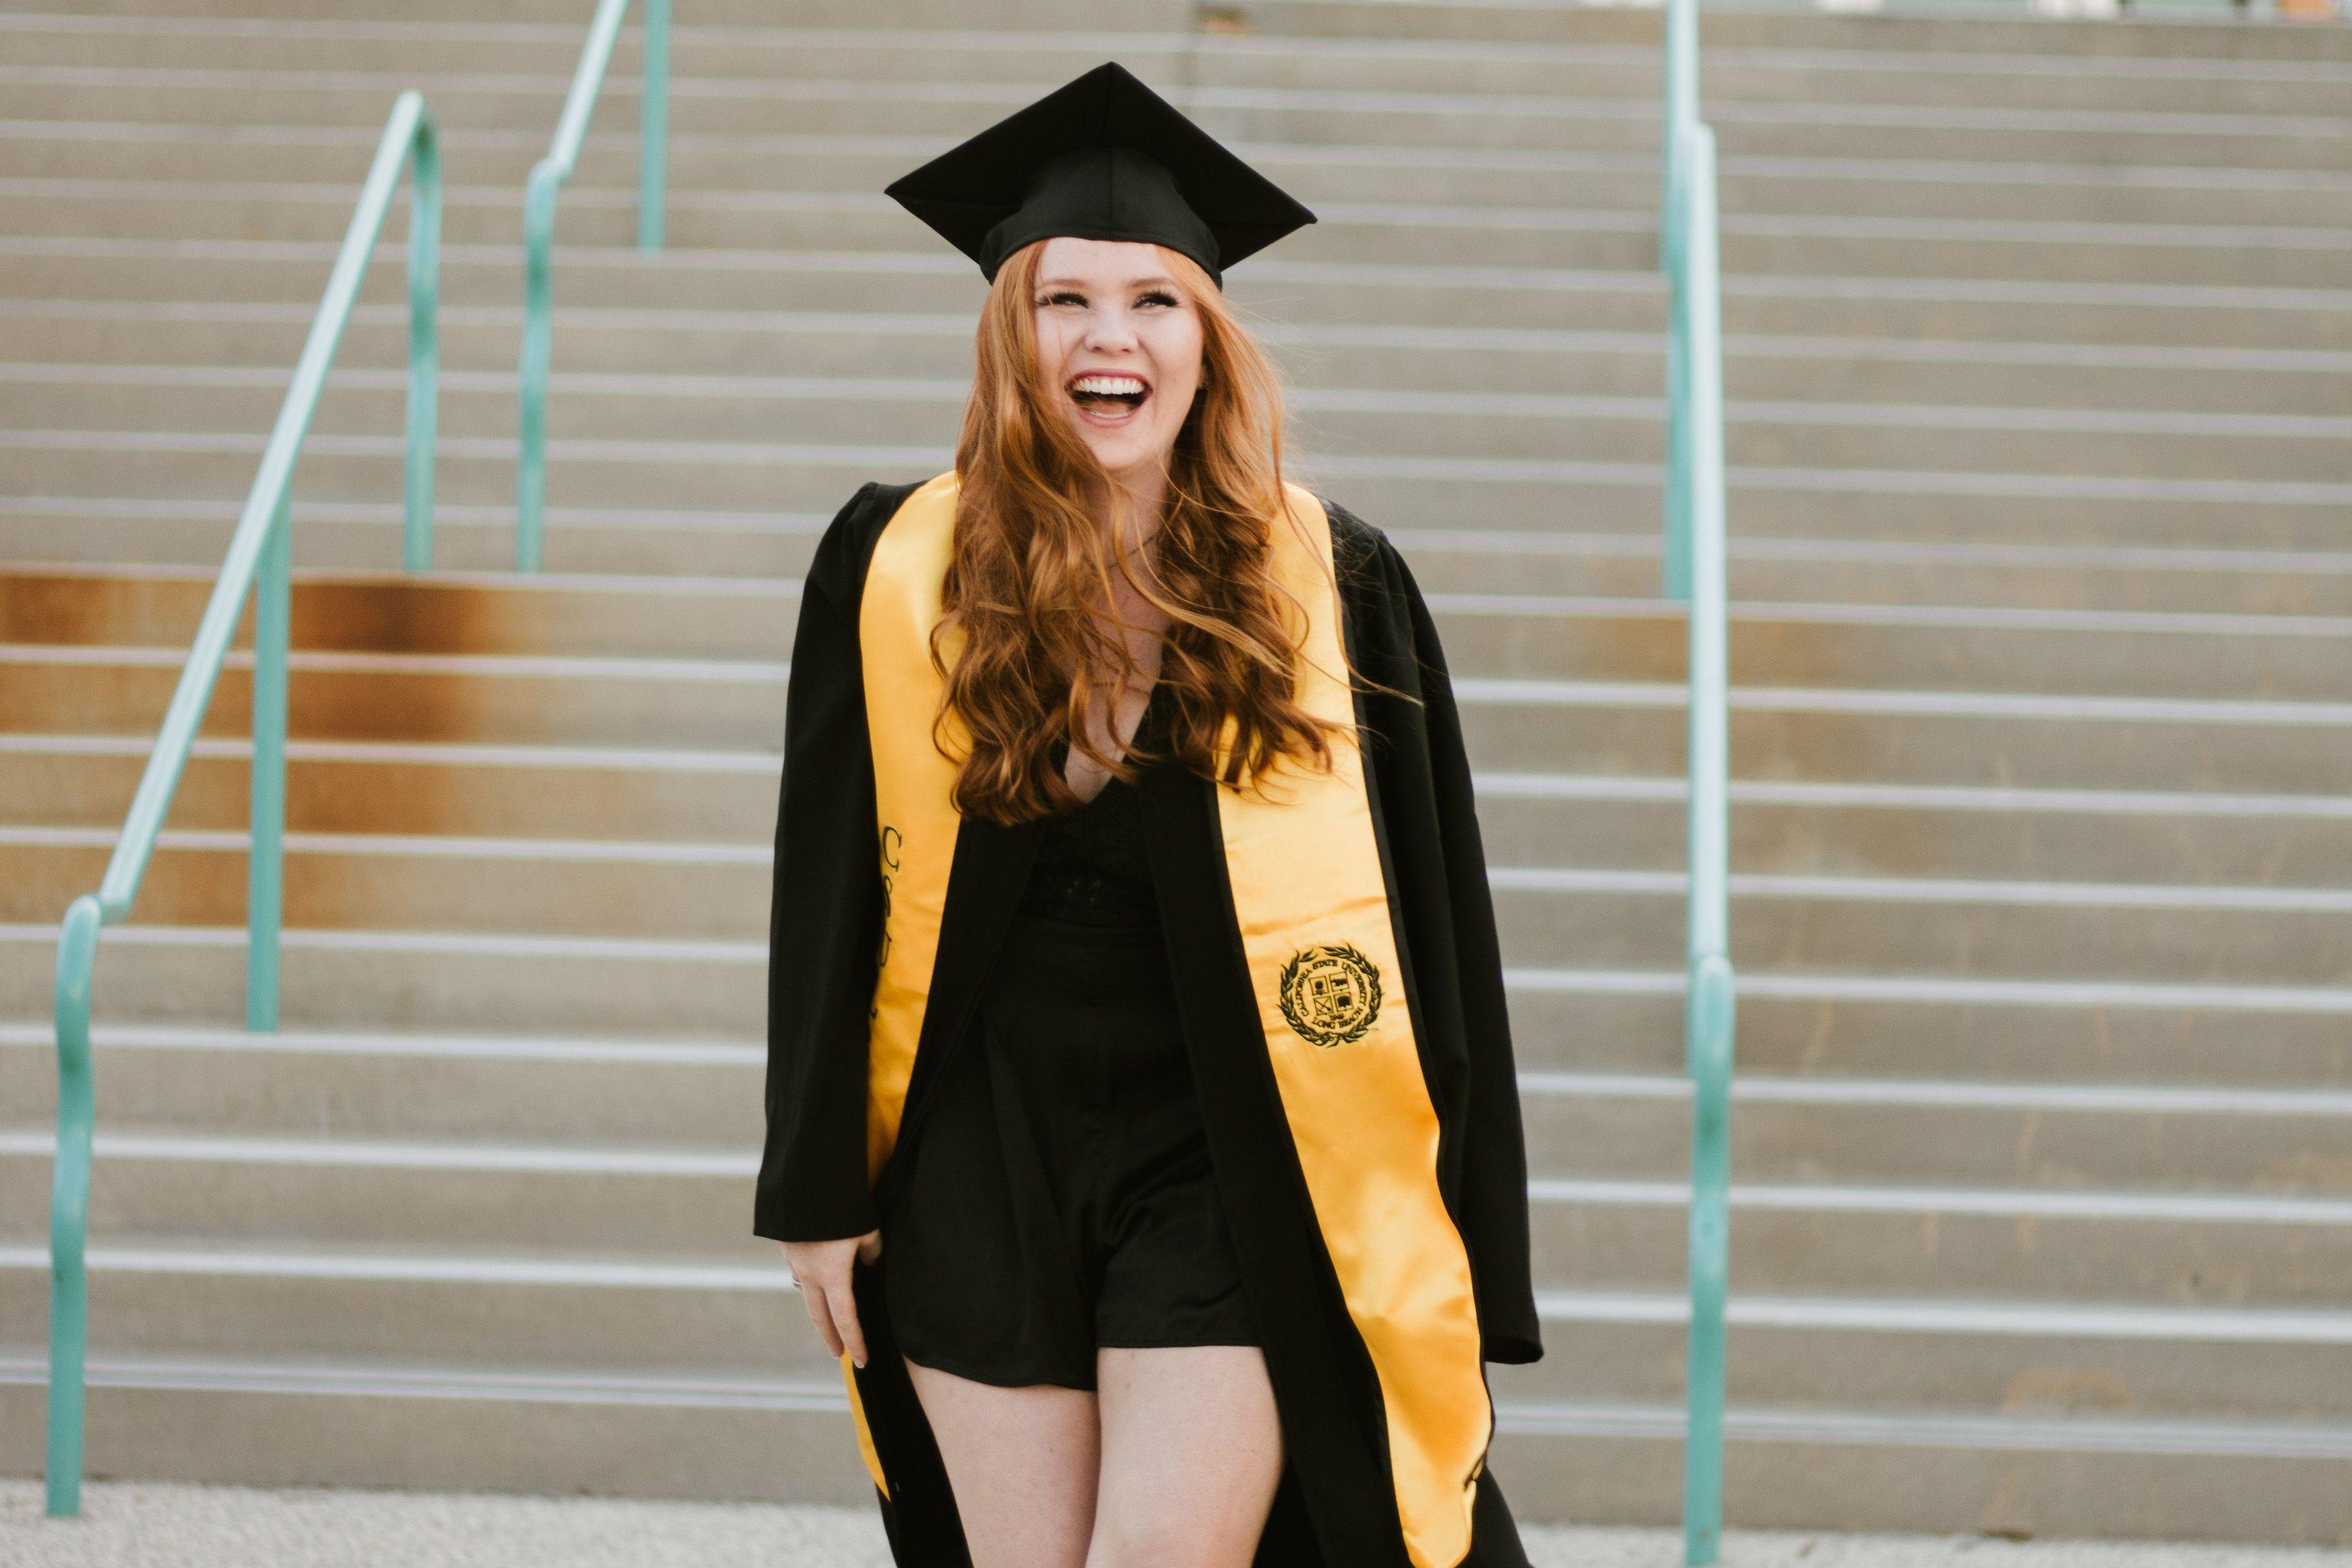 Senior Photos Grad Graduation Graduate Pictures Pics College Long